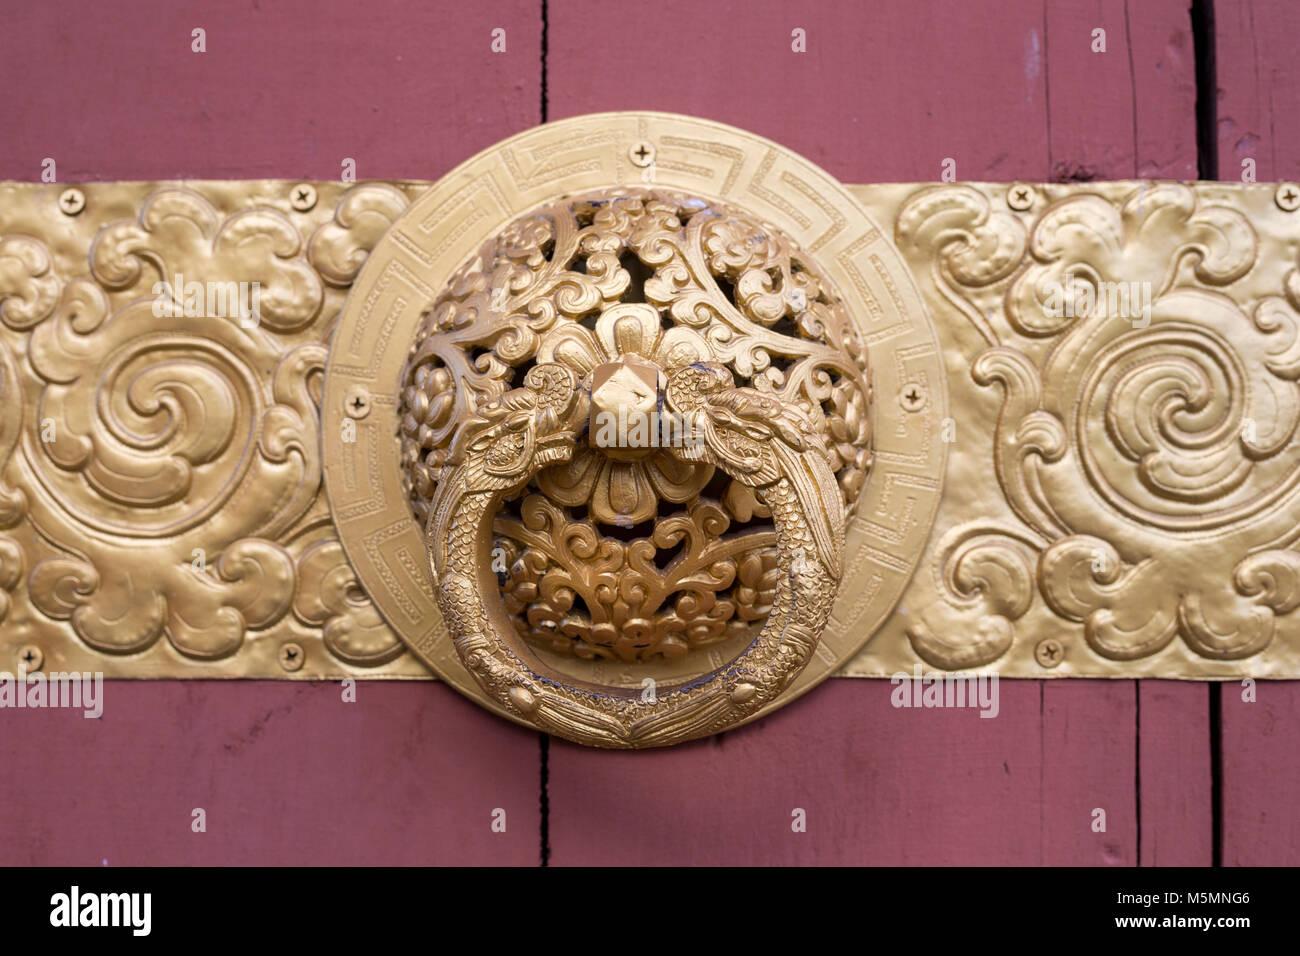 Thimphu, Bhutan.  Decoration on Doorway Opening to the National Memorial Chorten. - Stock Image